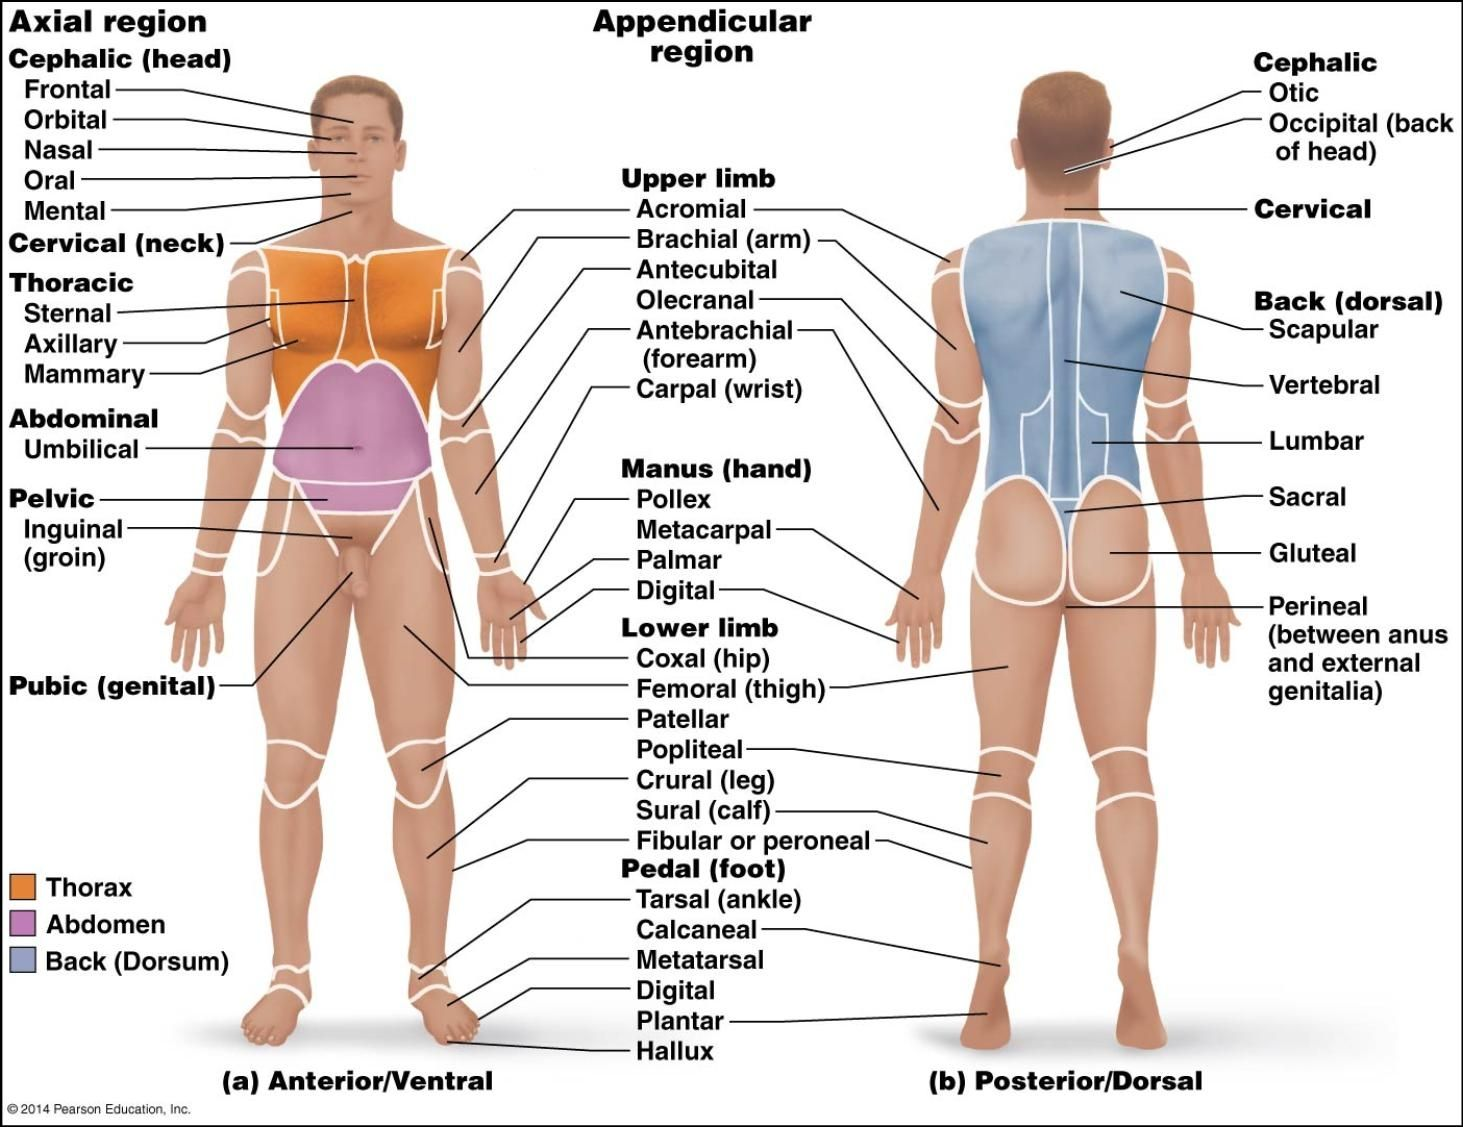 anatomical position labeled human anatomy diagram [ 1463 x 1127 Pixel ]